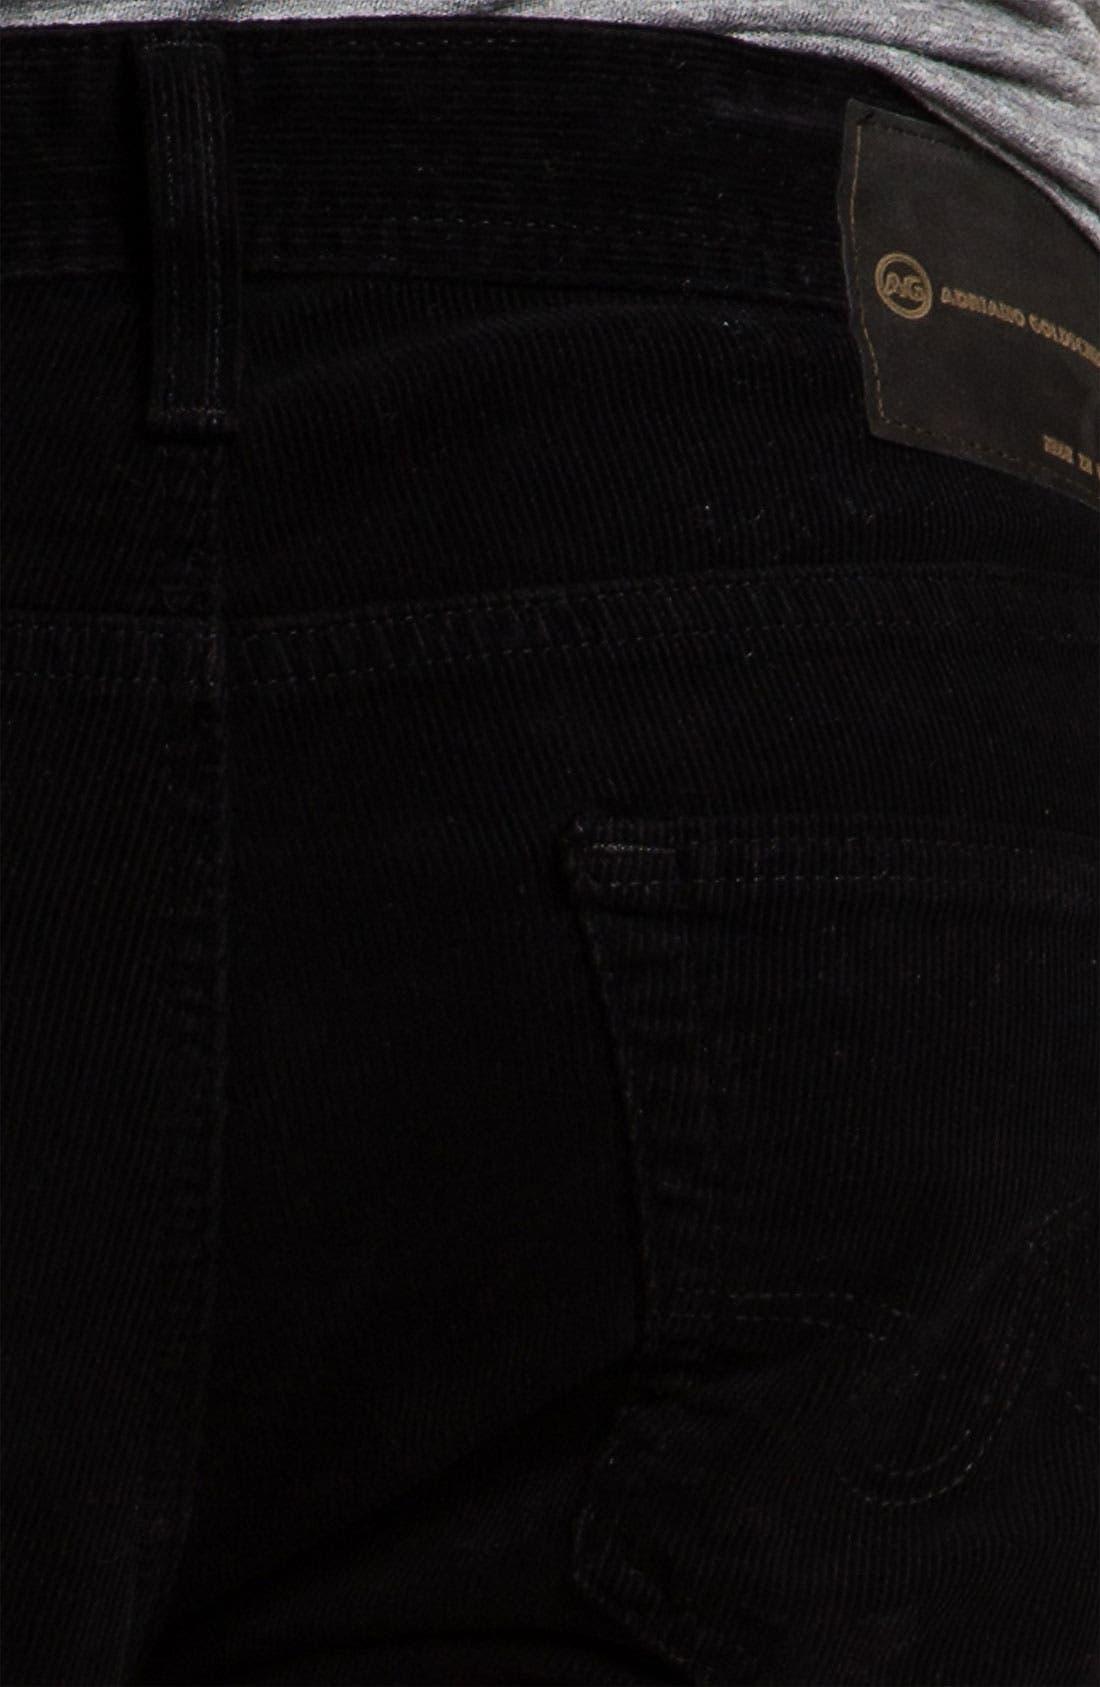 Jeans 'Matchbox' Slim Straight Leg Corduroy Pants,                             Alternate thumbnail 2, color,                             010